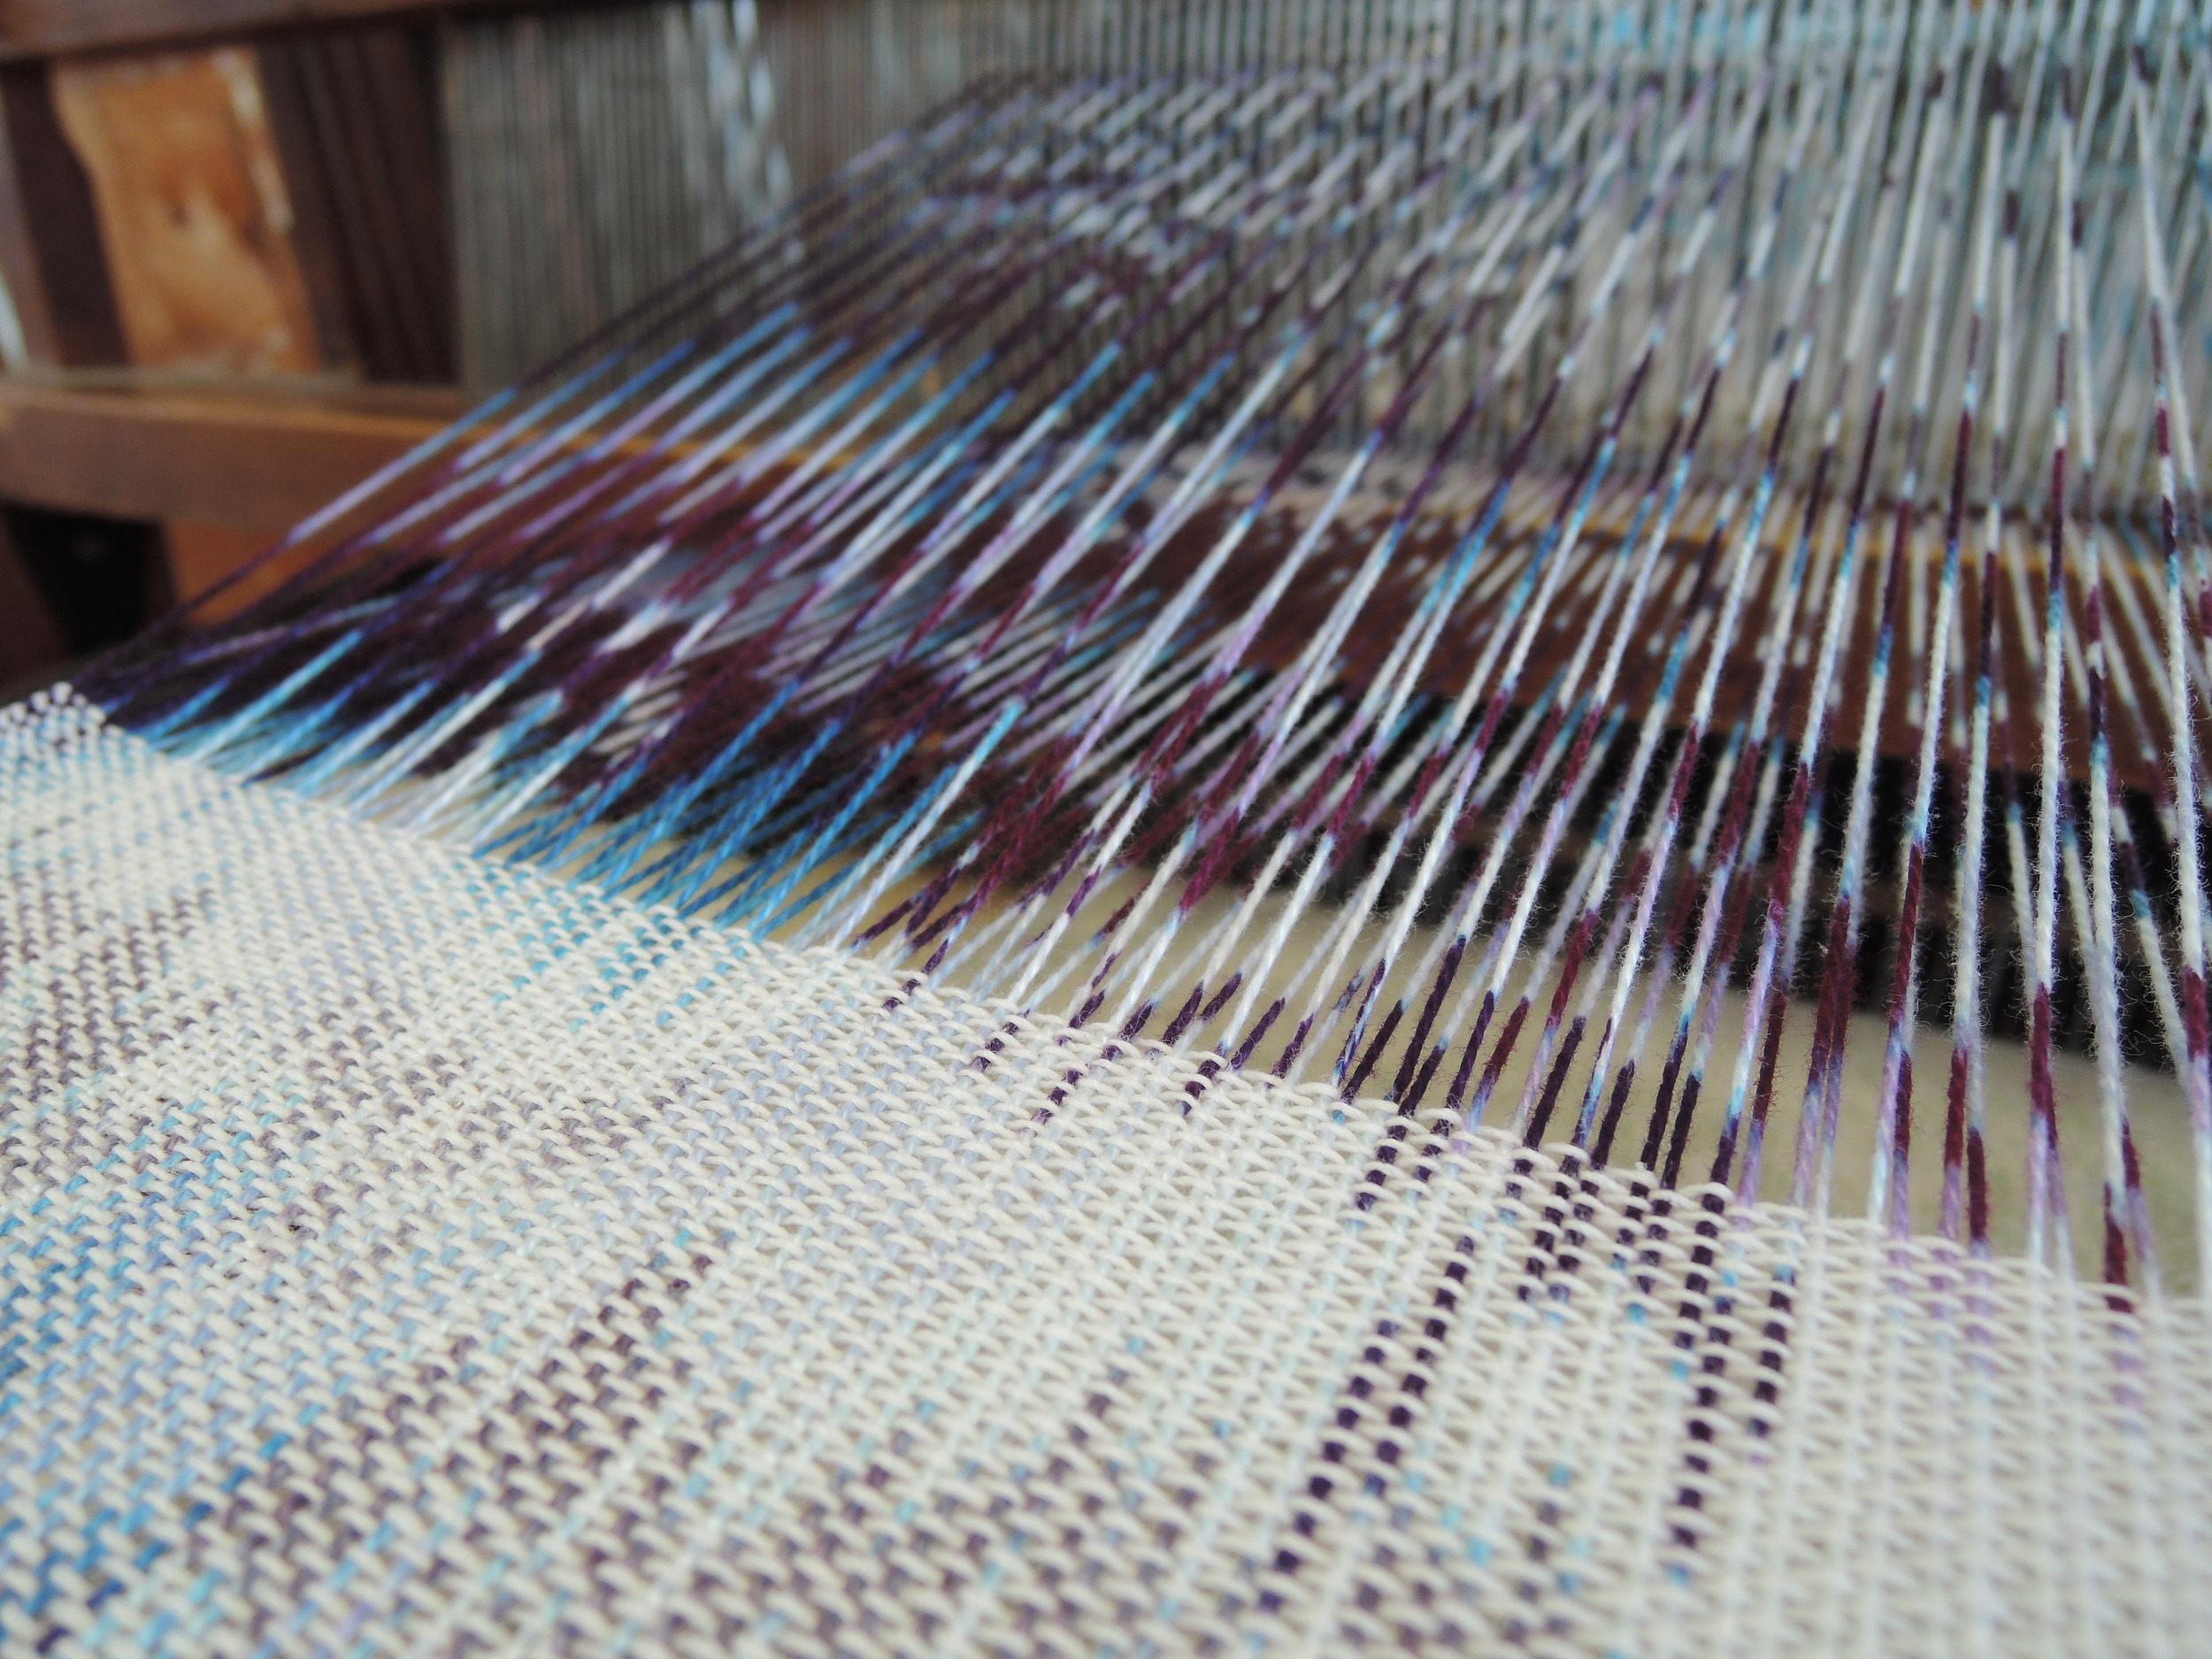 Mid weaving.